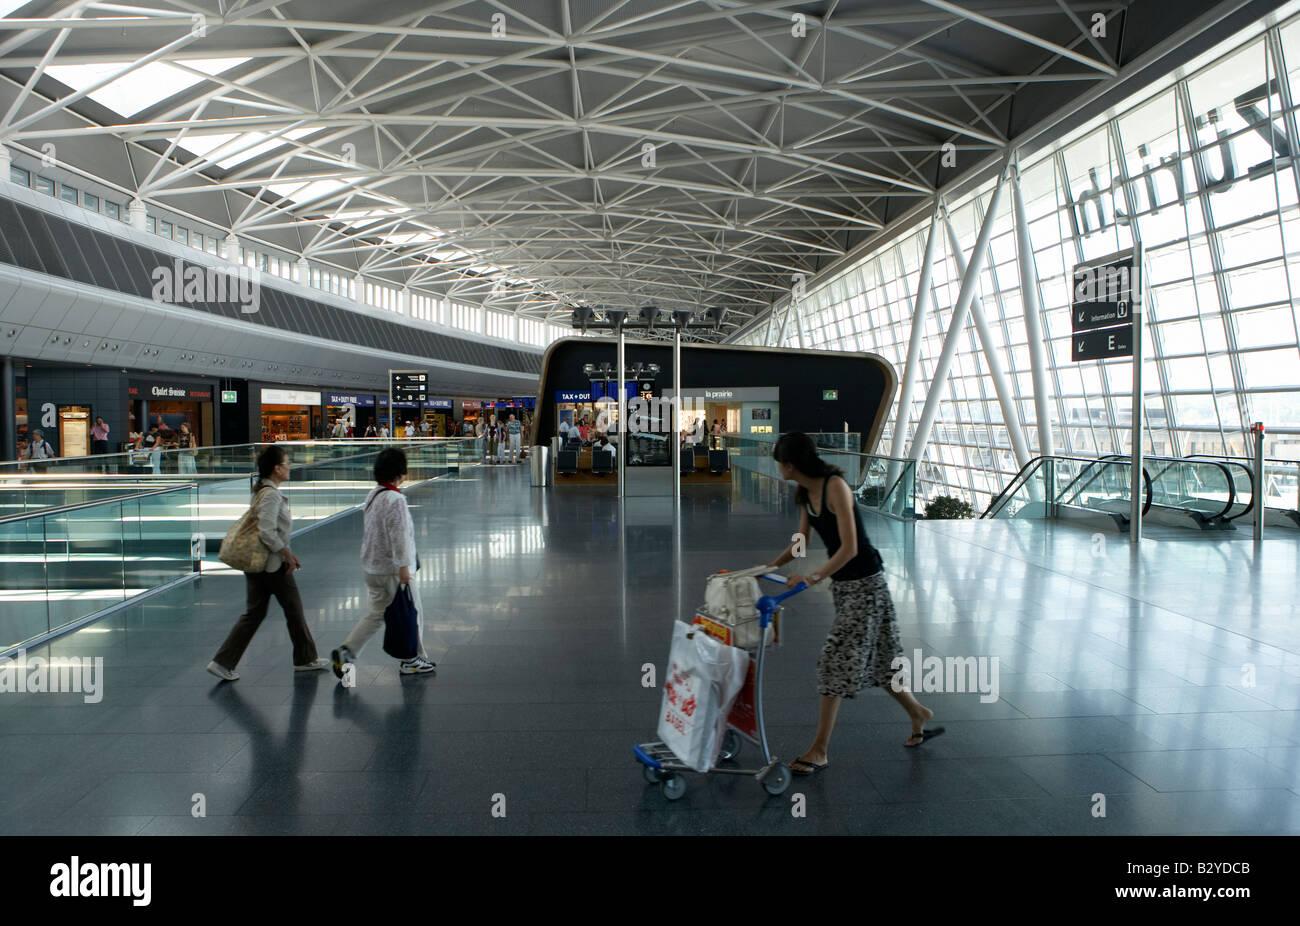 Interior view of the Airside Center of the airport in Kloten, Zuerich, Switzerland - Stock Image